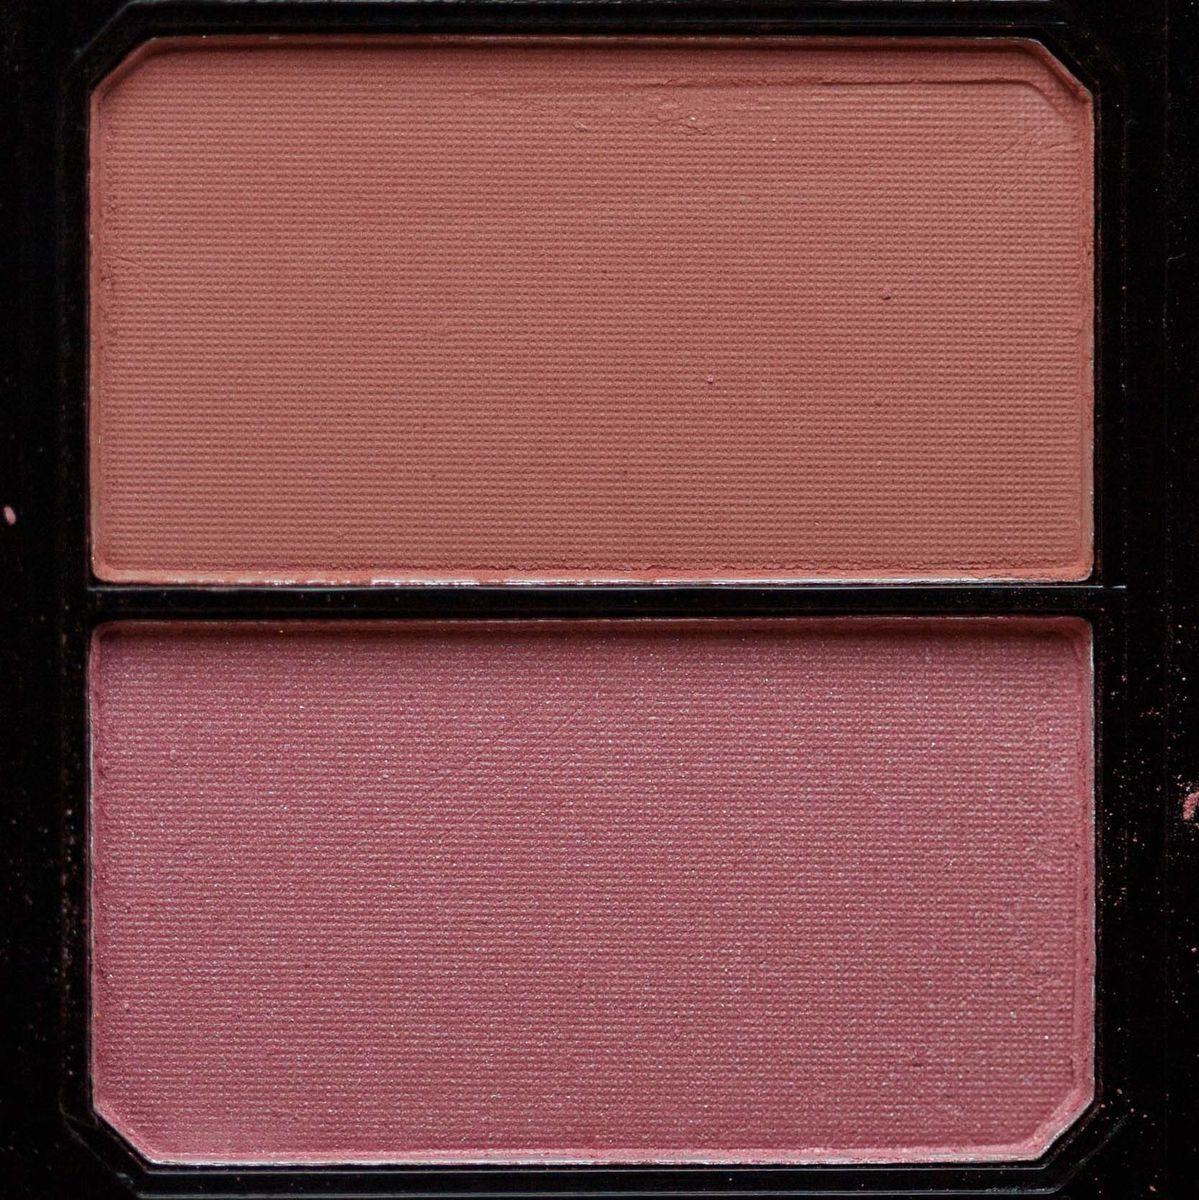 Румяна Parisa B-702, №05 Розово-коричневый, 5 г